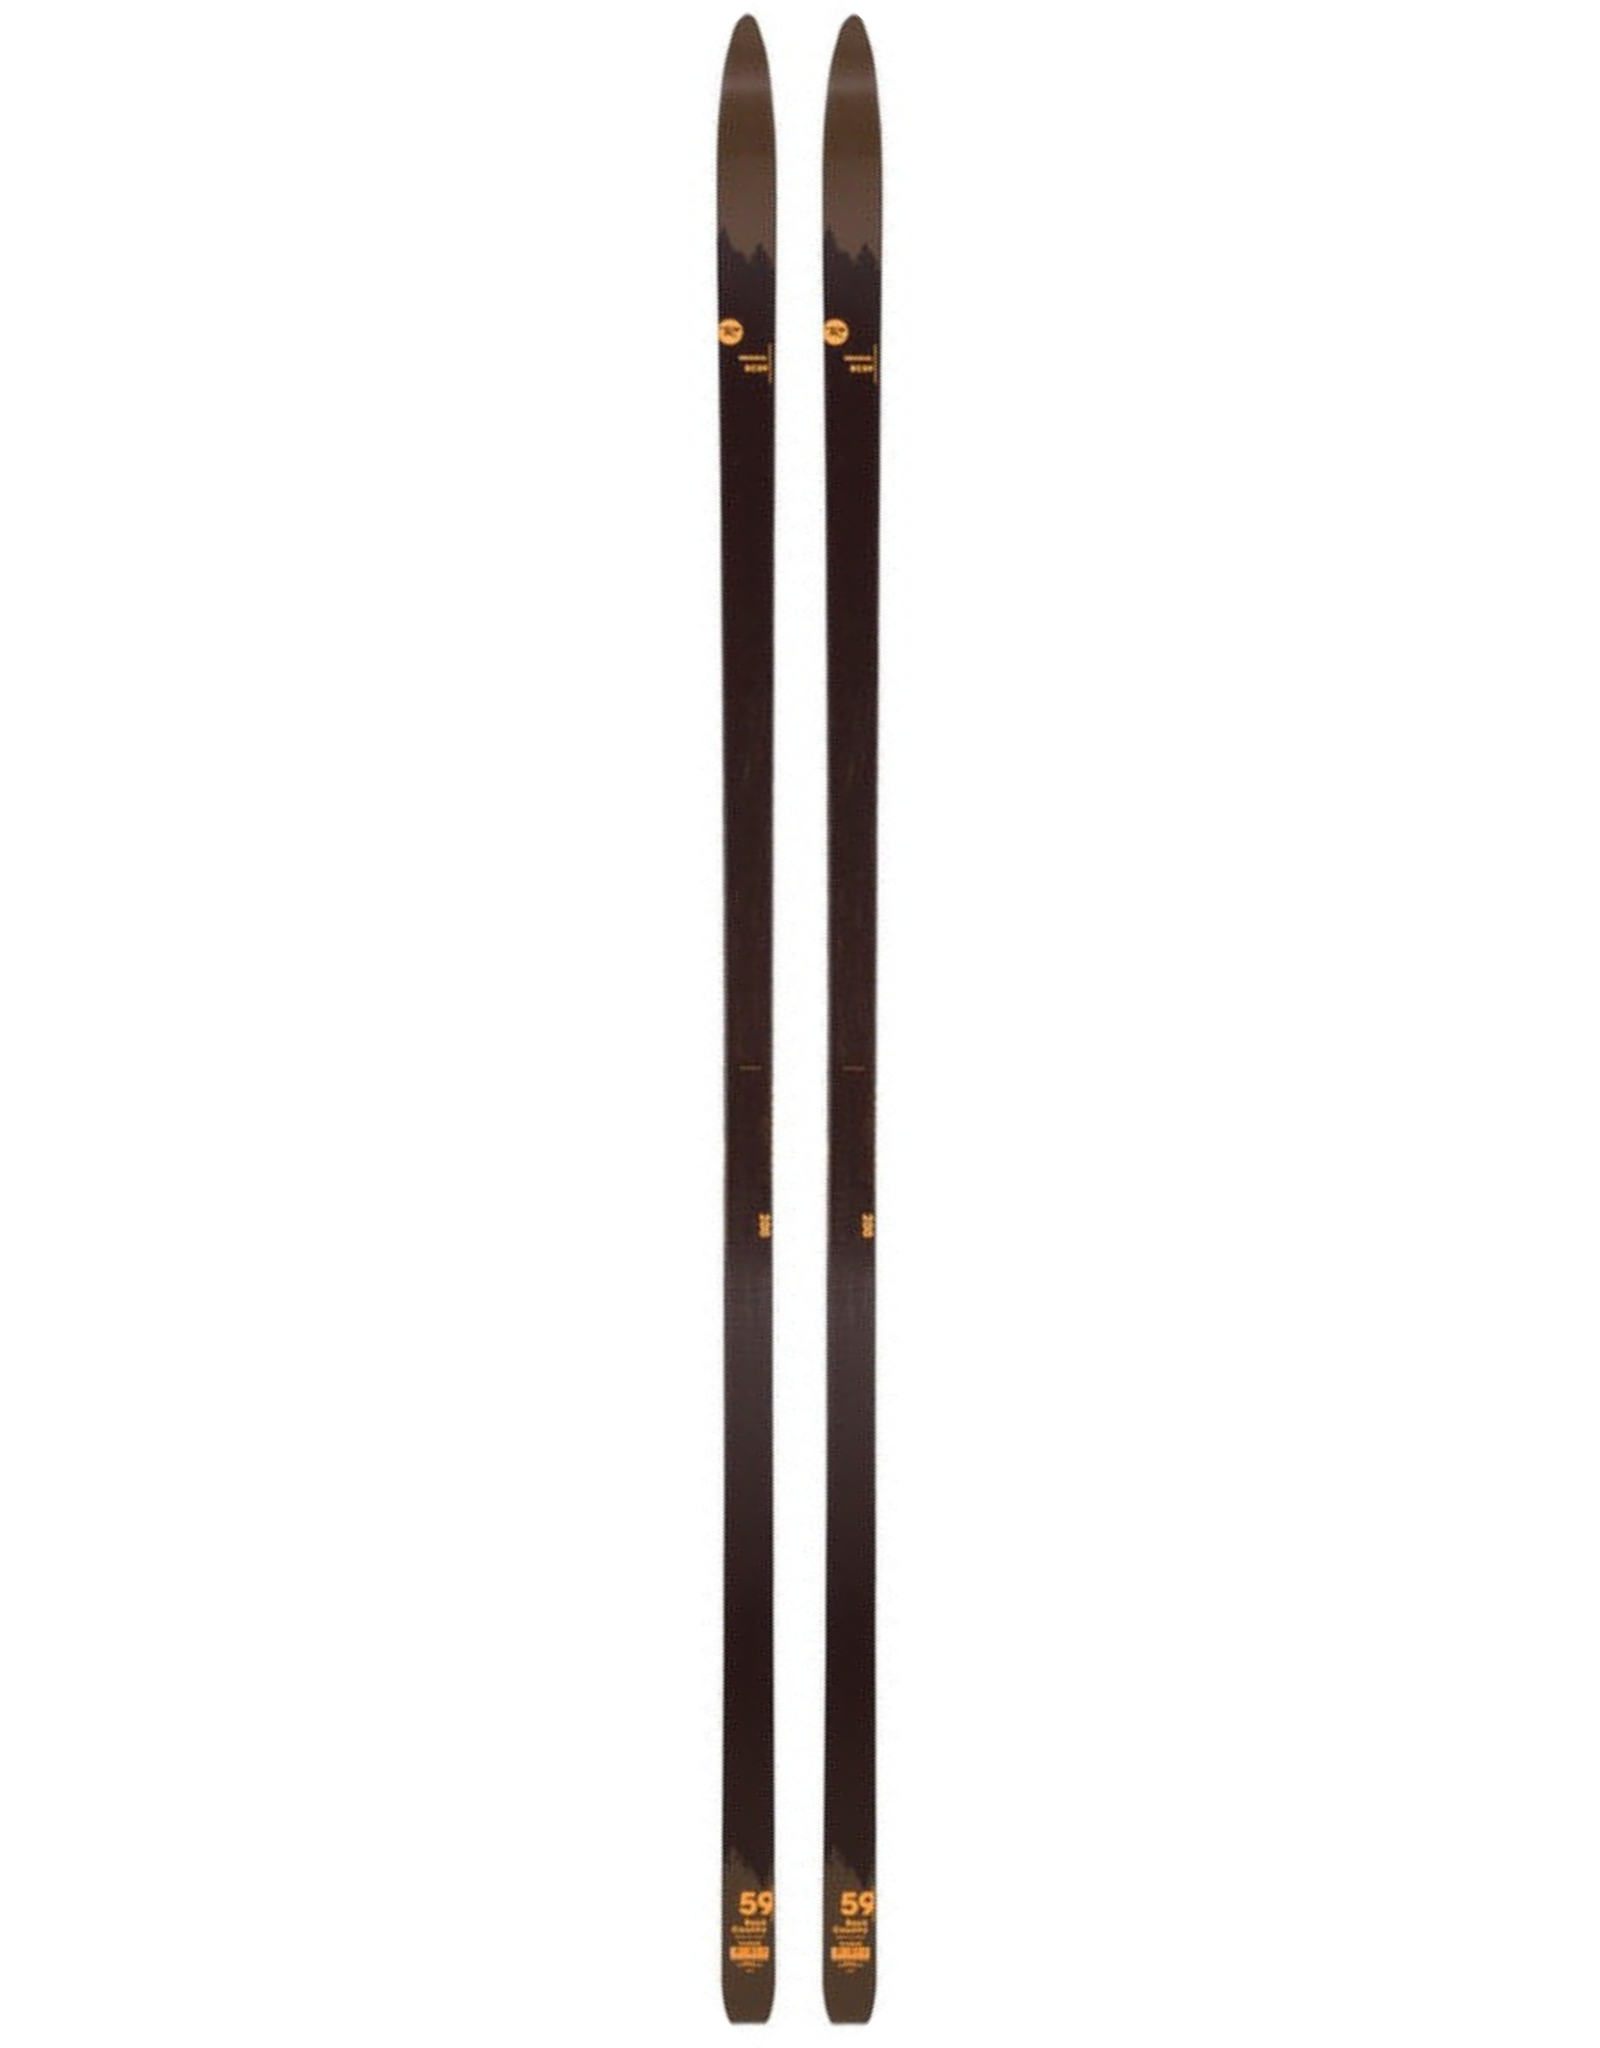 ROSSIGNOL ROSSIGNOL BC 59 SKI DE FOND SR BLK-BRN 20